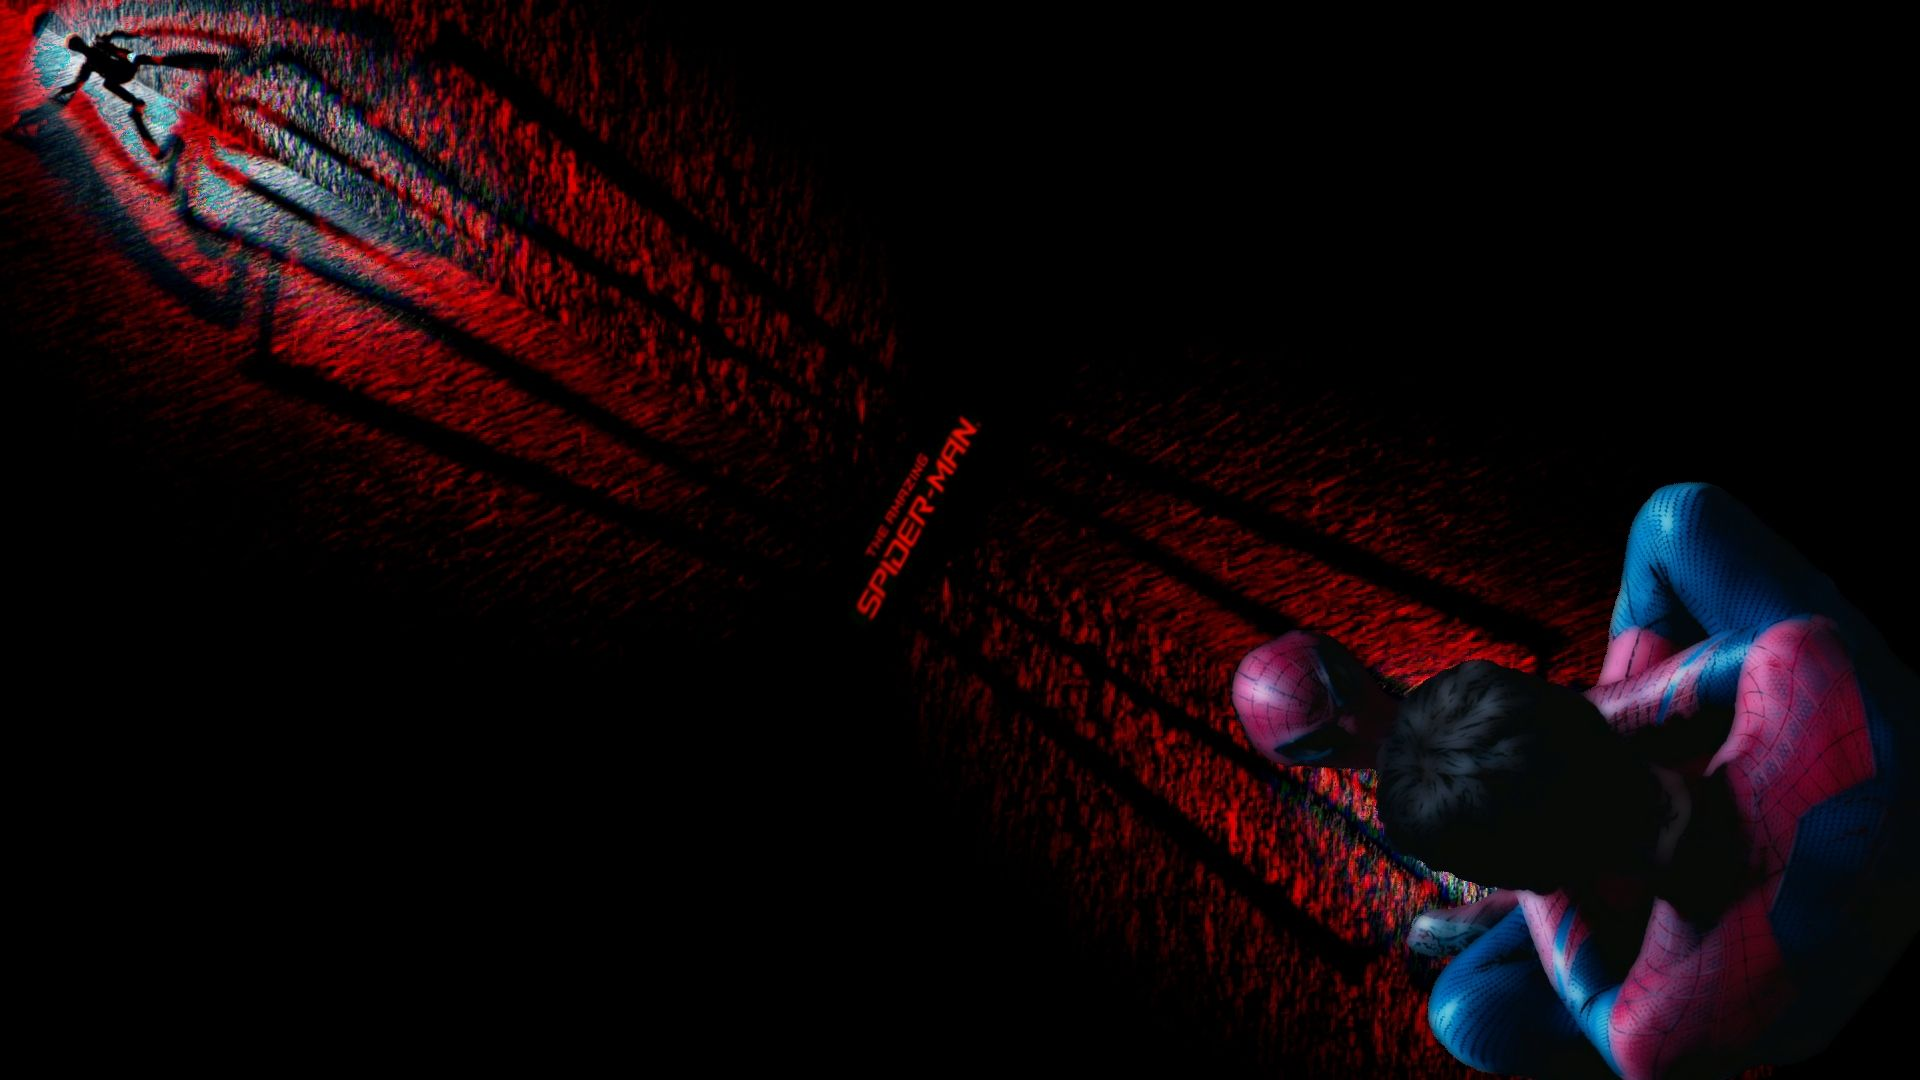 Movies Spiderman 2012 desktop wallpaper nr 61691 by acsfuzik 1920x1080